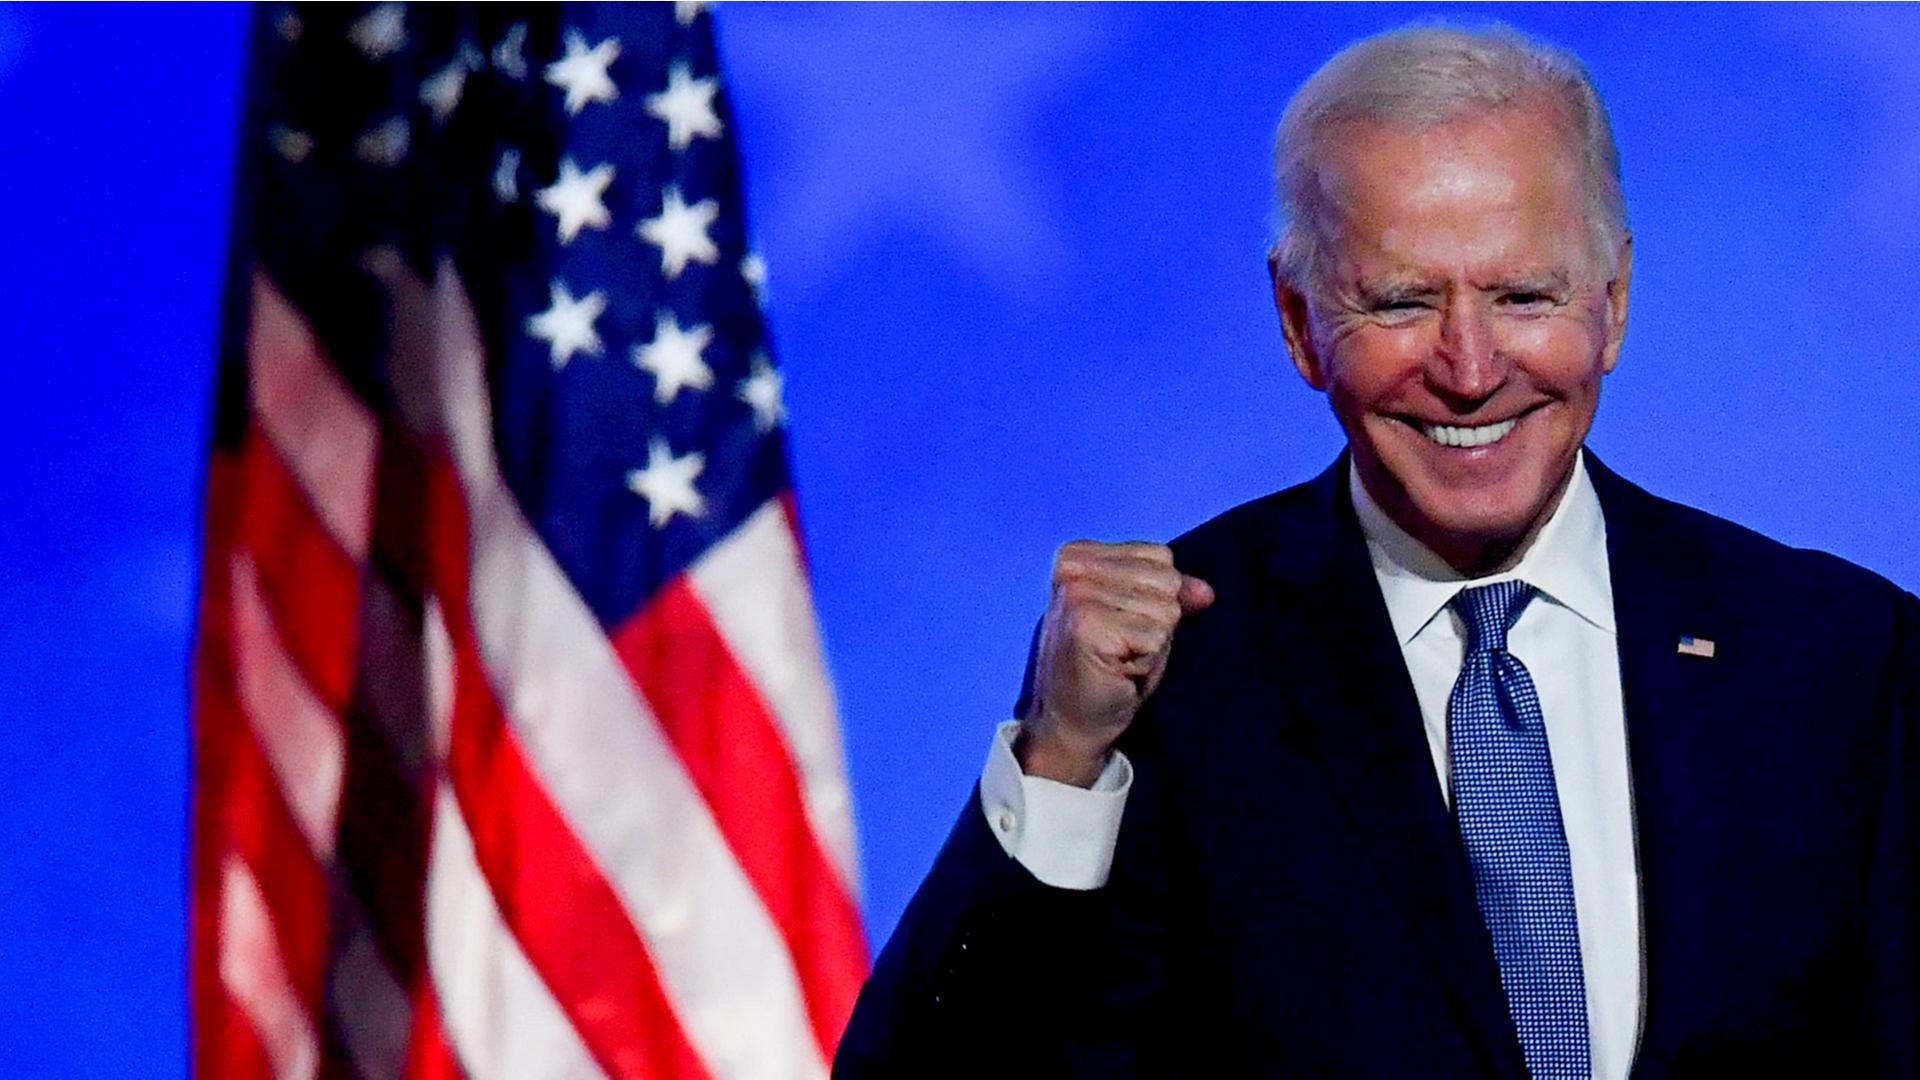 Joe Biden becomes the 46th US president